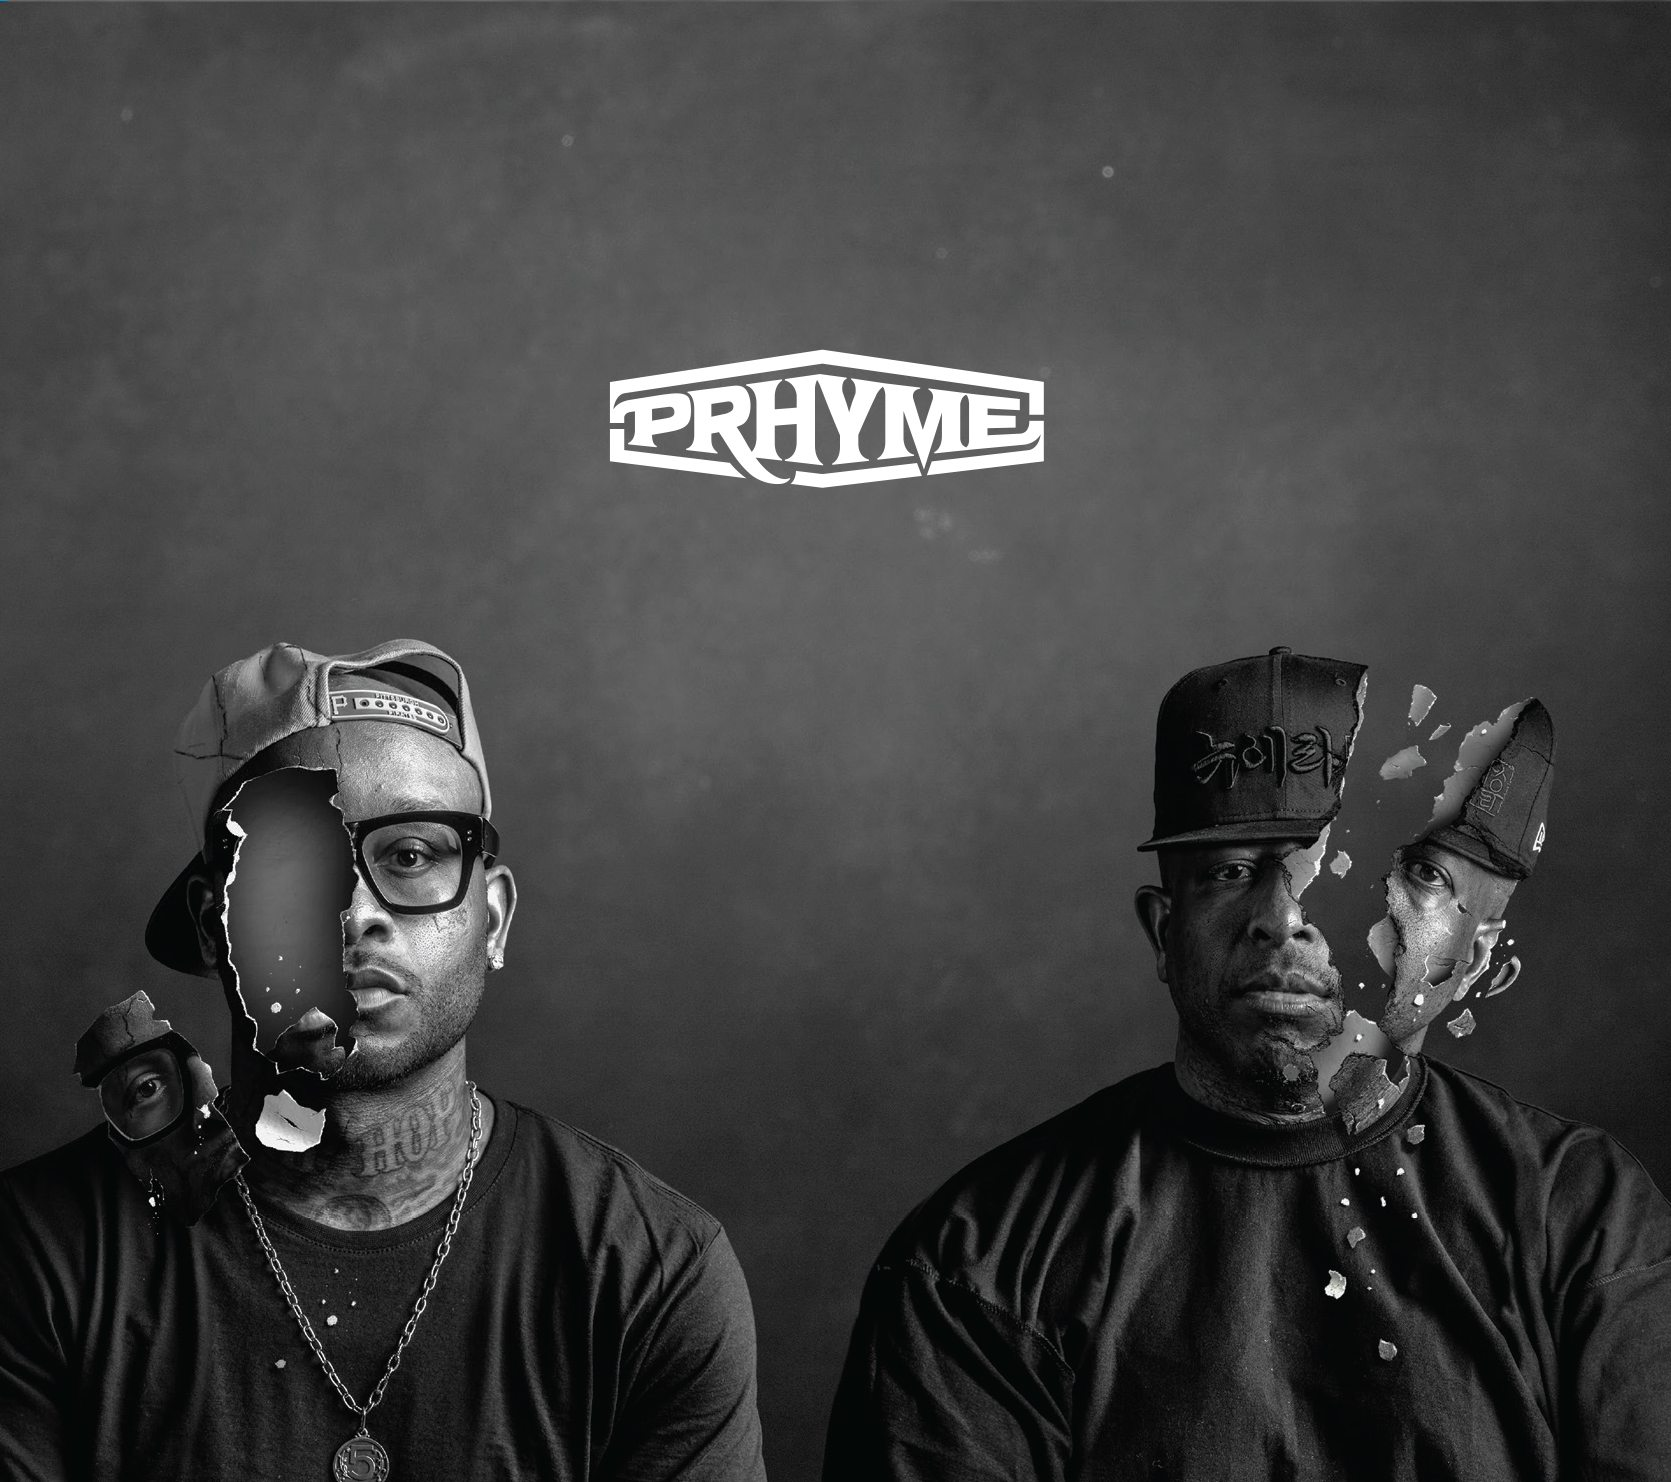 Eminem, Shady XV, Royce Da 5´9´´, Dj Premier, Prhyme